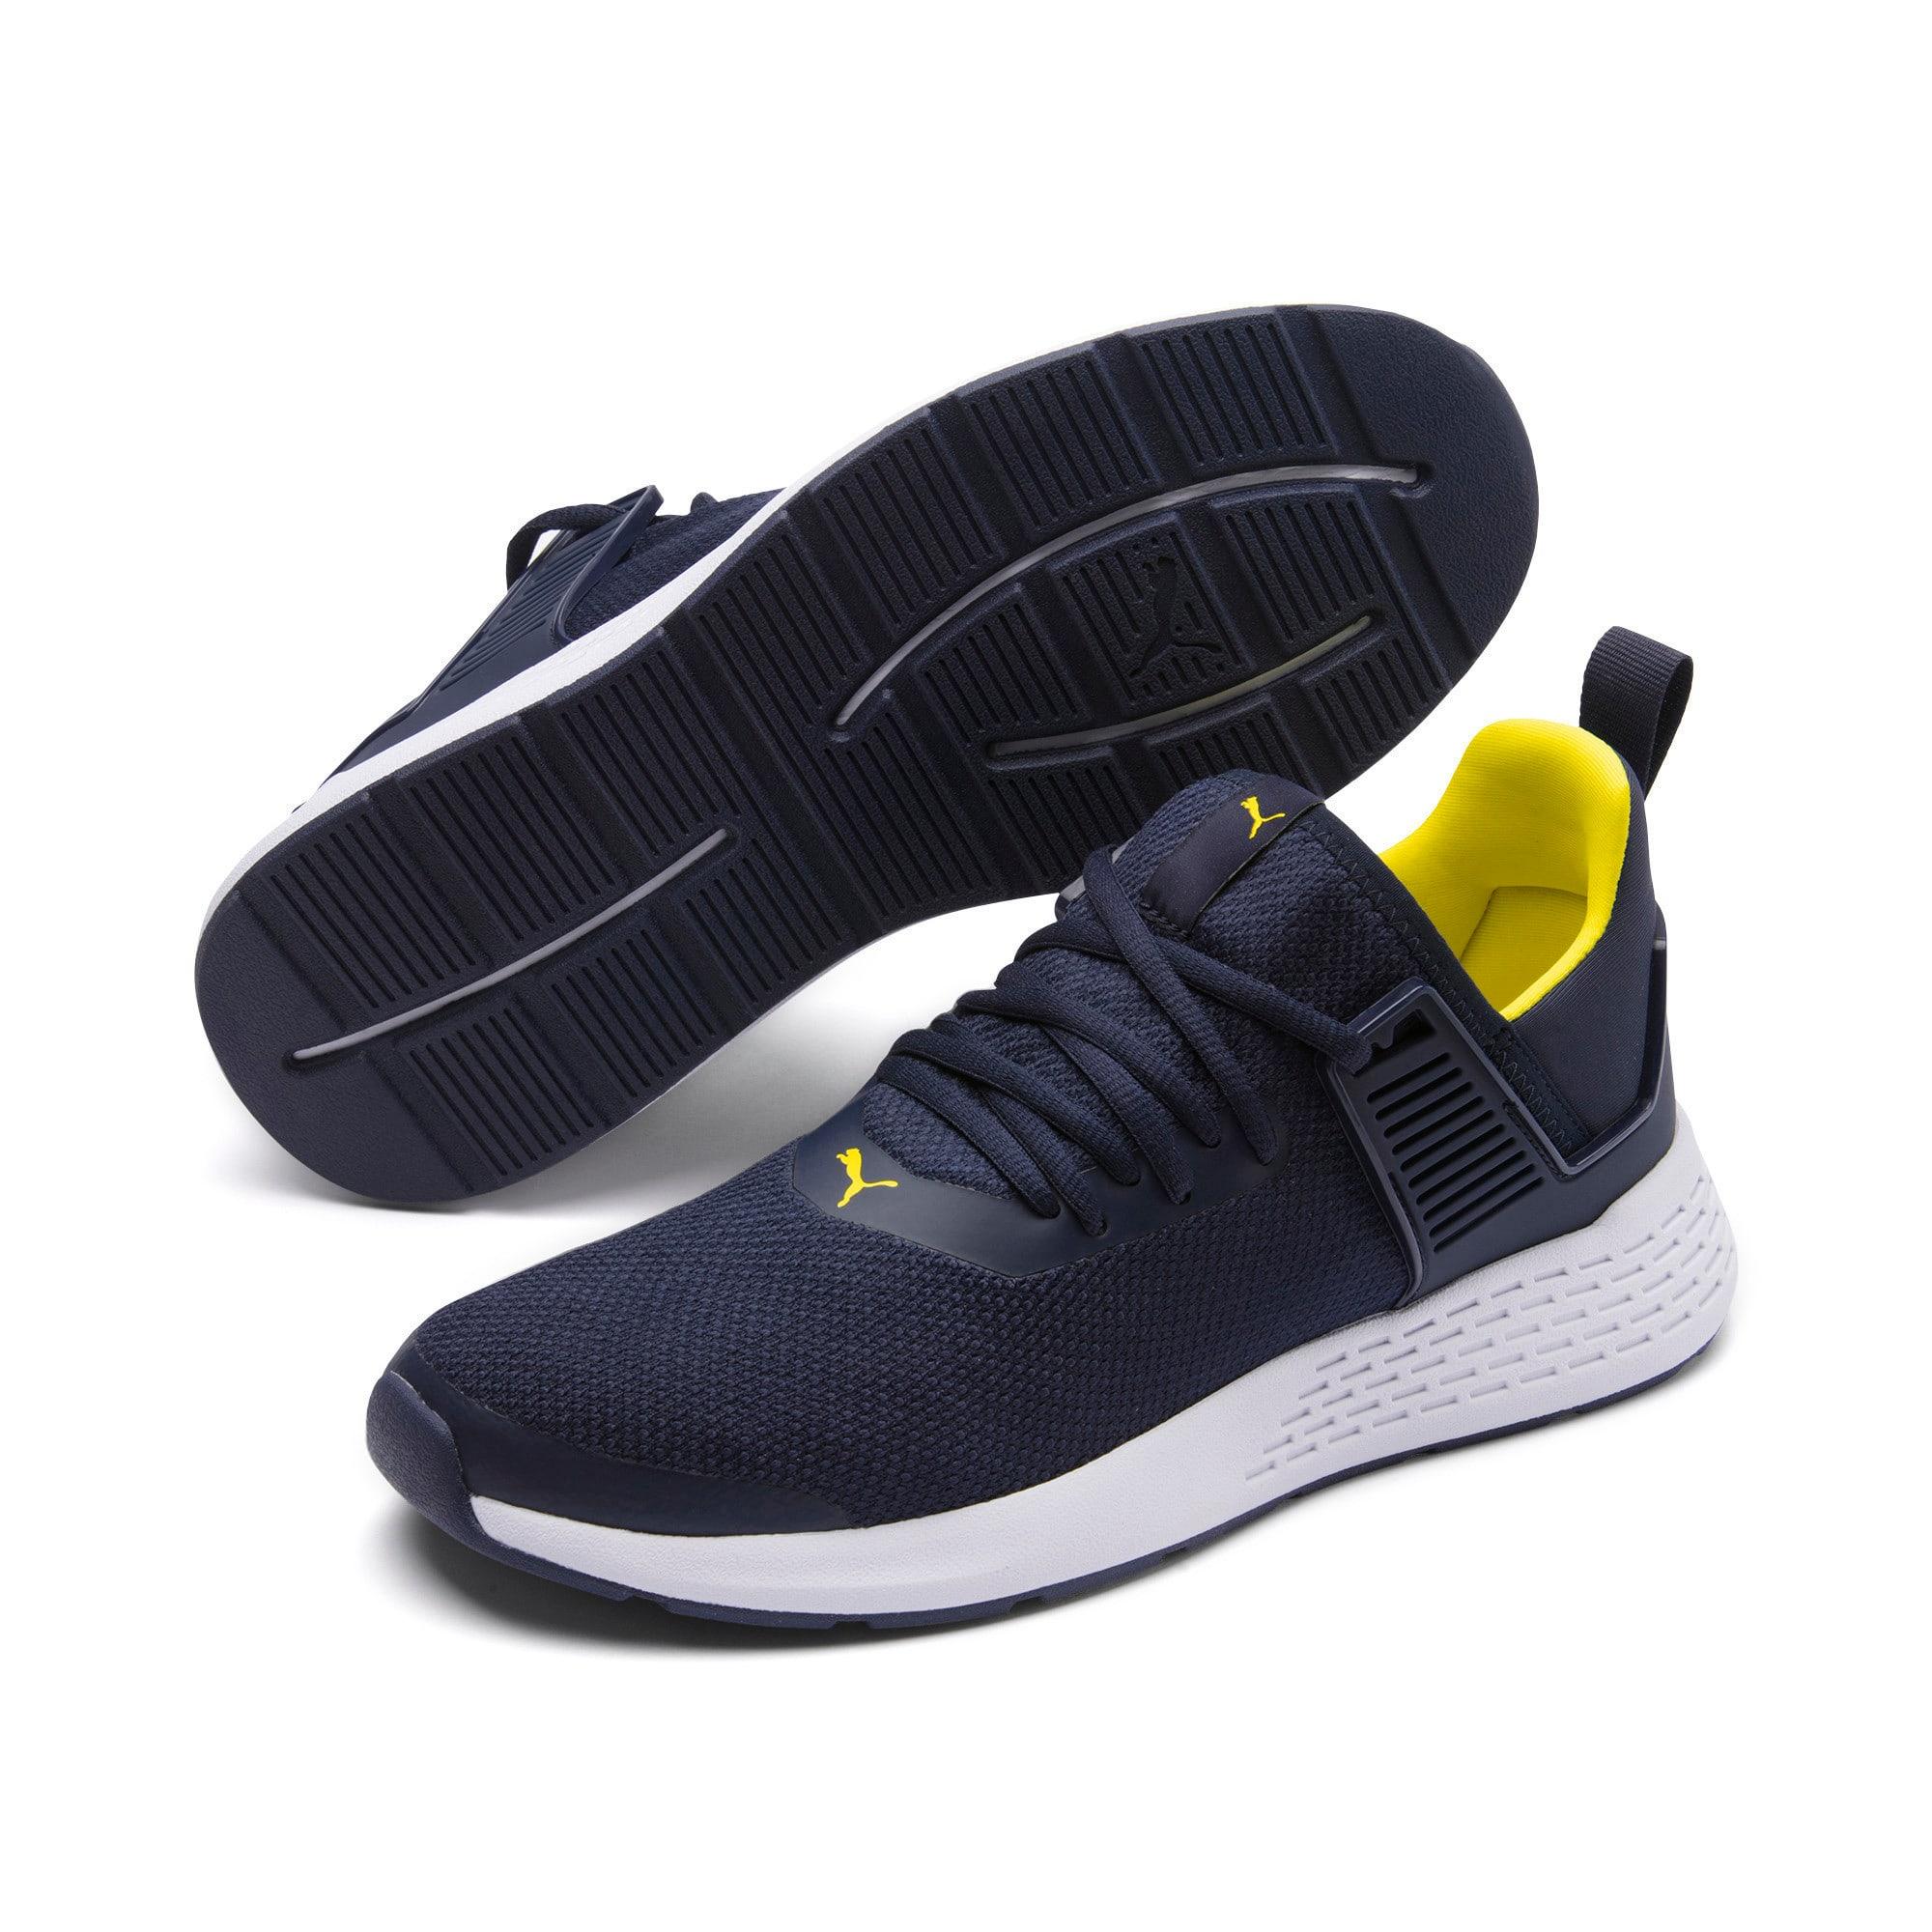 Thumbnail 3 of Insurge Mesh Sneakers, Peacoat-Blazing Yellow-White, medium-IND